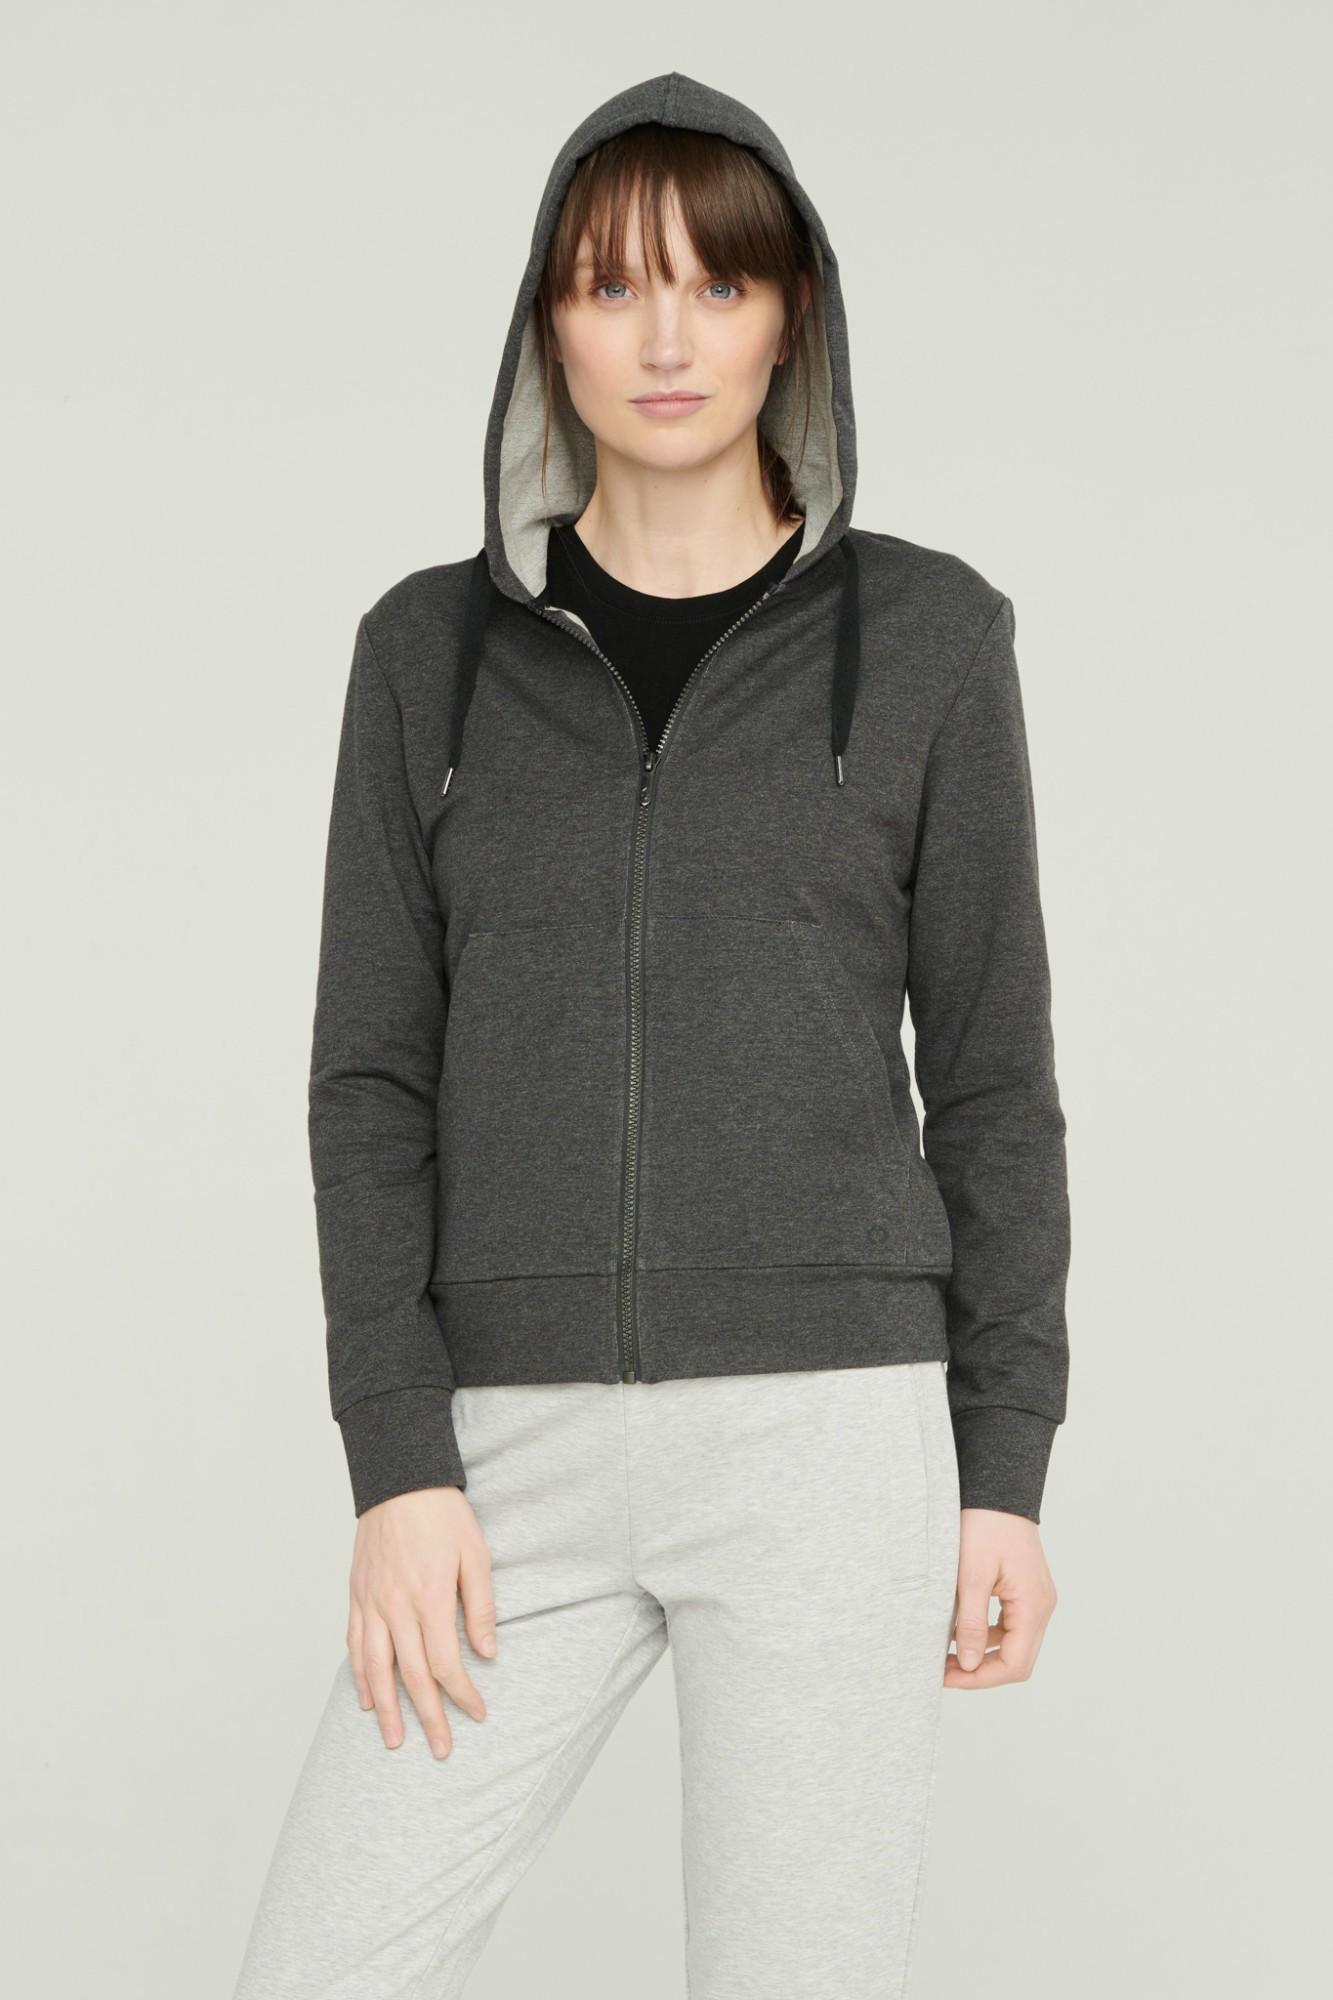 AUDIMAS Atsegamas medv. džemp. su gobtuvu 2111-062 Dark Grey Melange XL